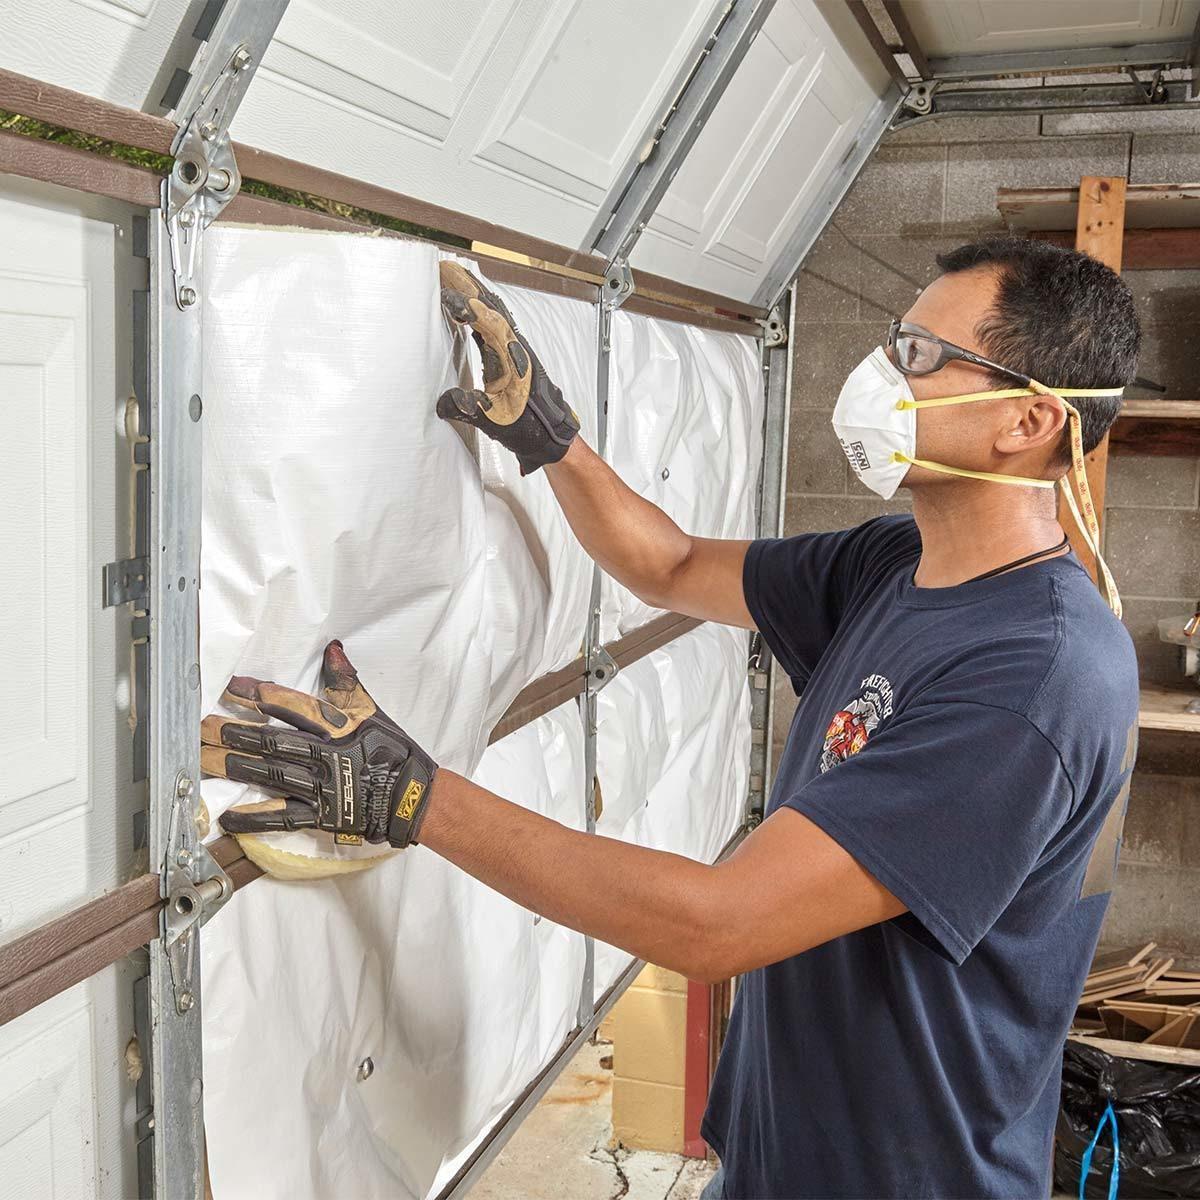 Hobby-Friendly Garages